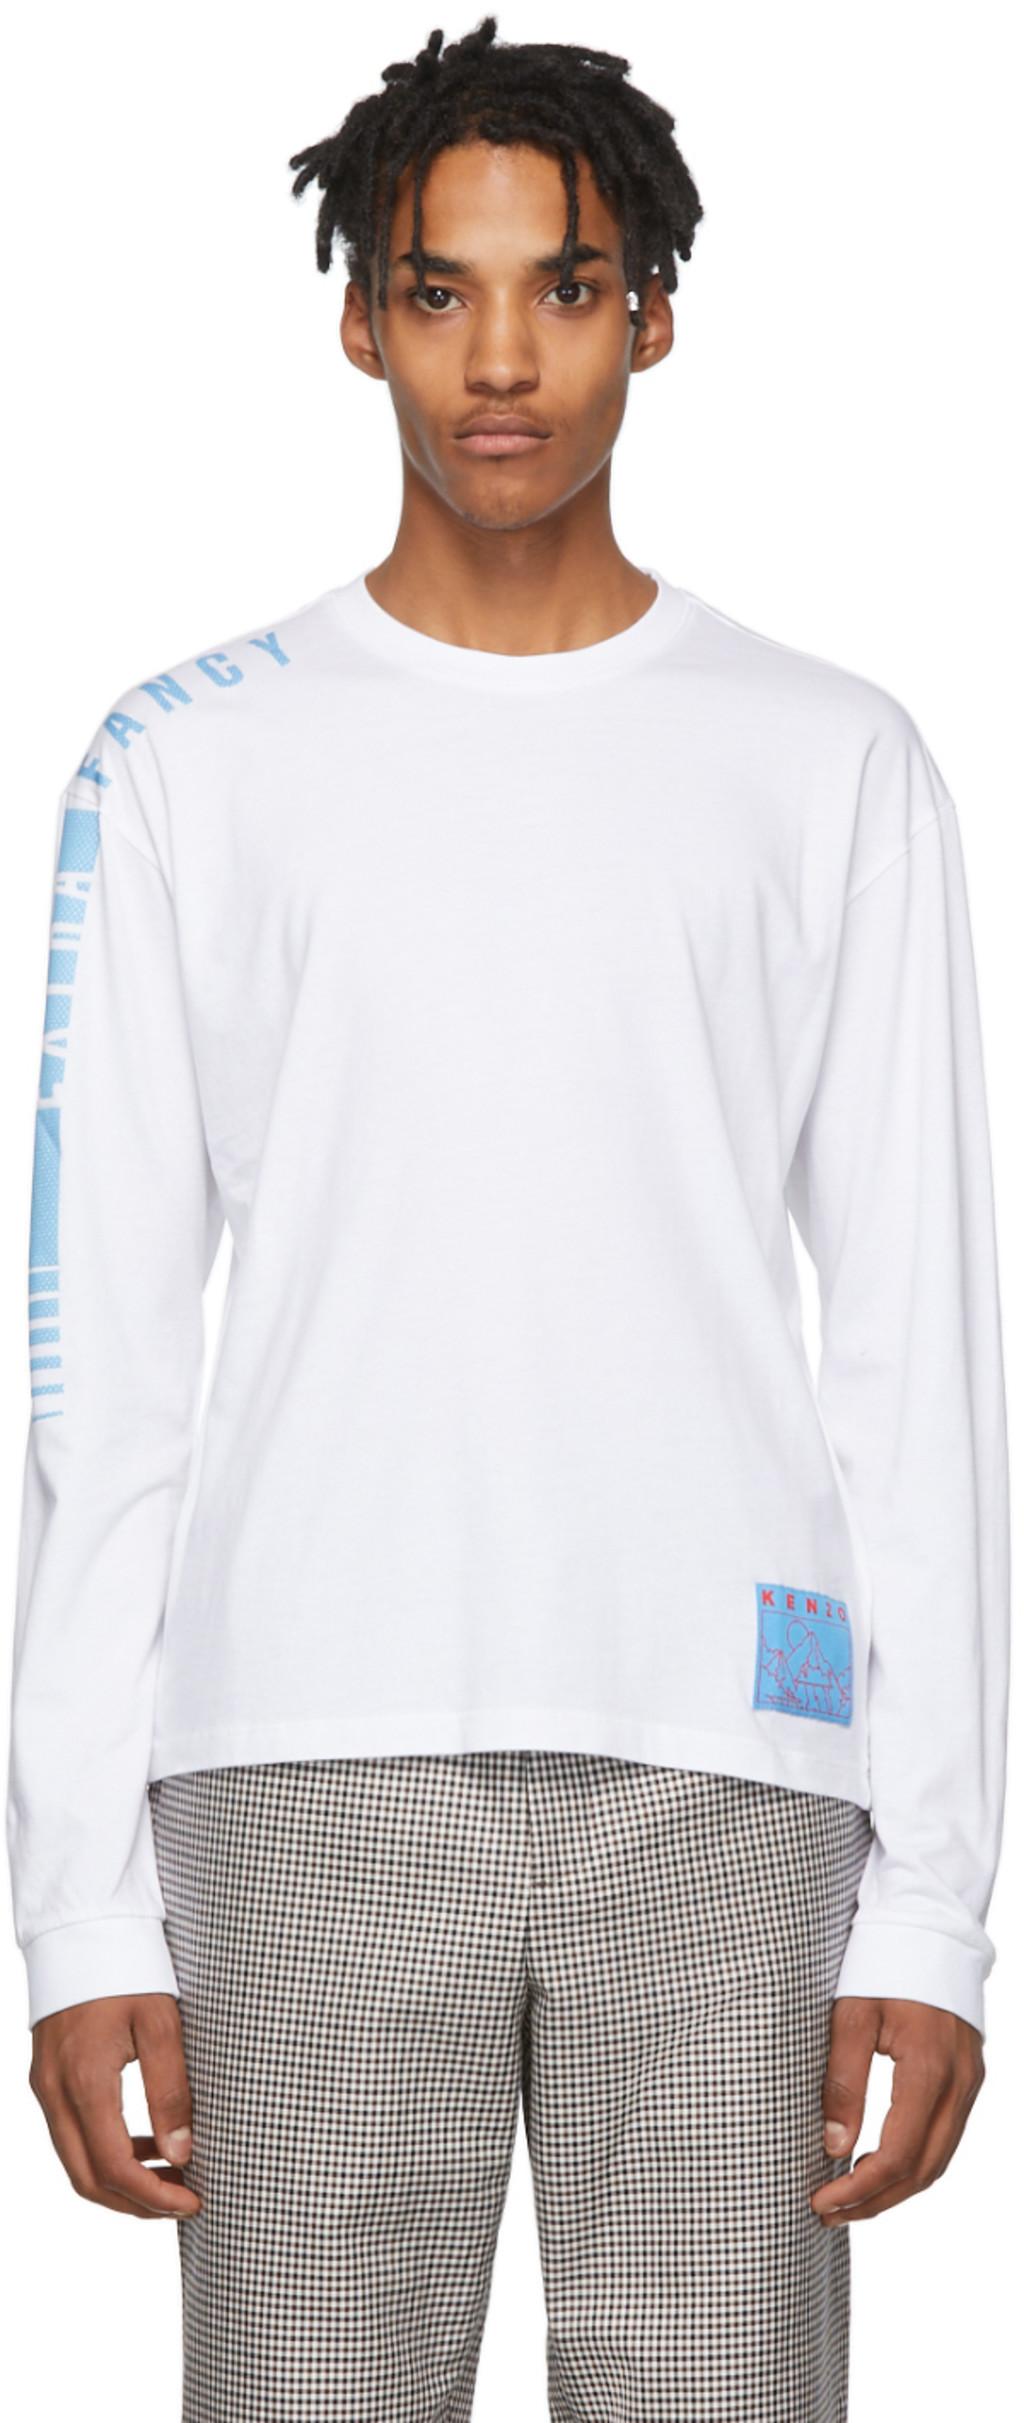 b405c917 White 'Extra Fancy' Long Sleeve T-Shirt